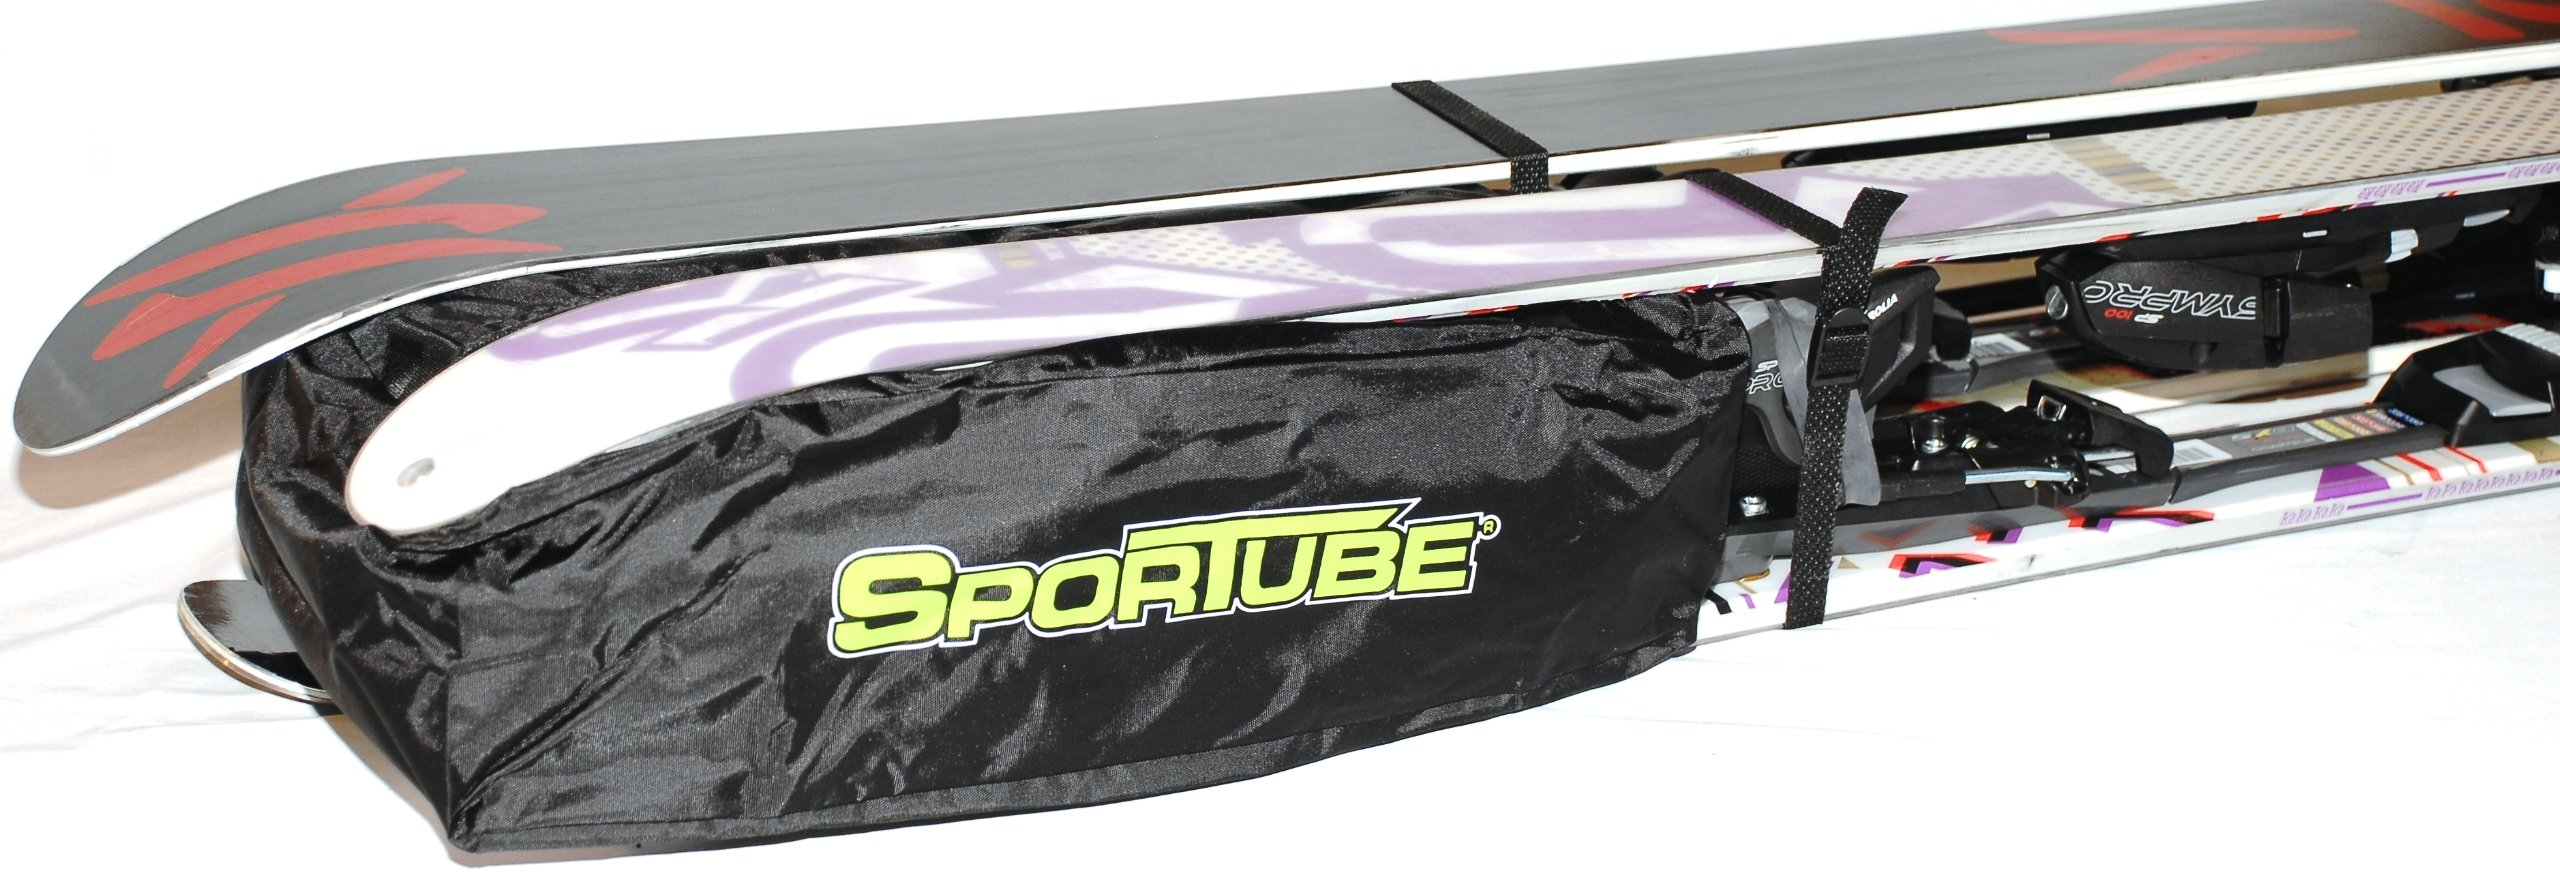 Sportube Nik Nac Pac by Sportube